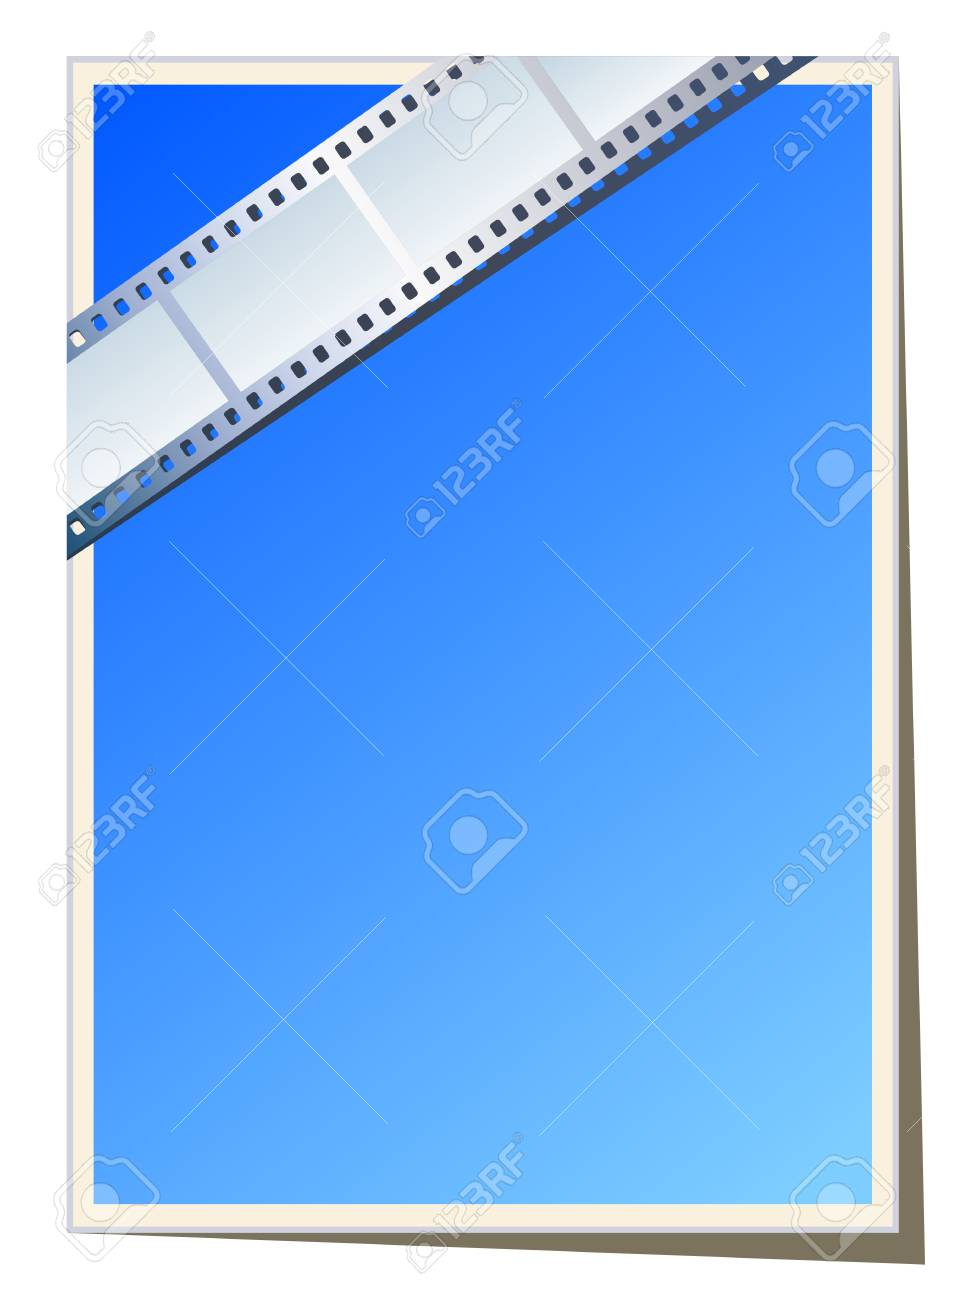 Blank photo - video template, illustration Stock Vector - 9935180